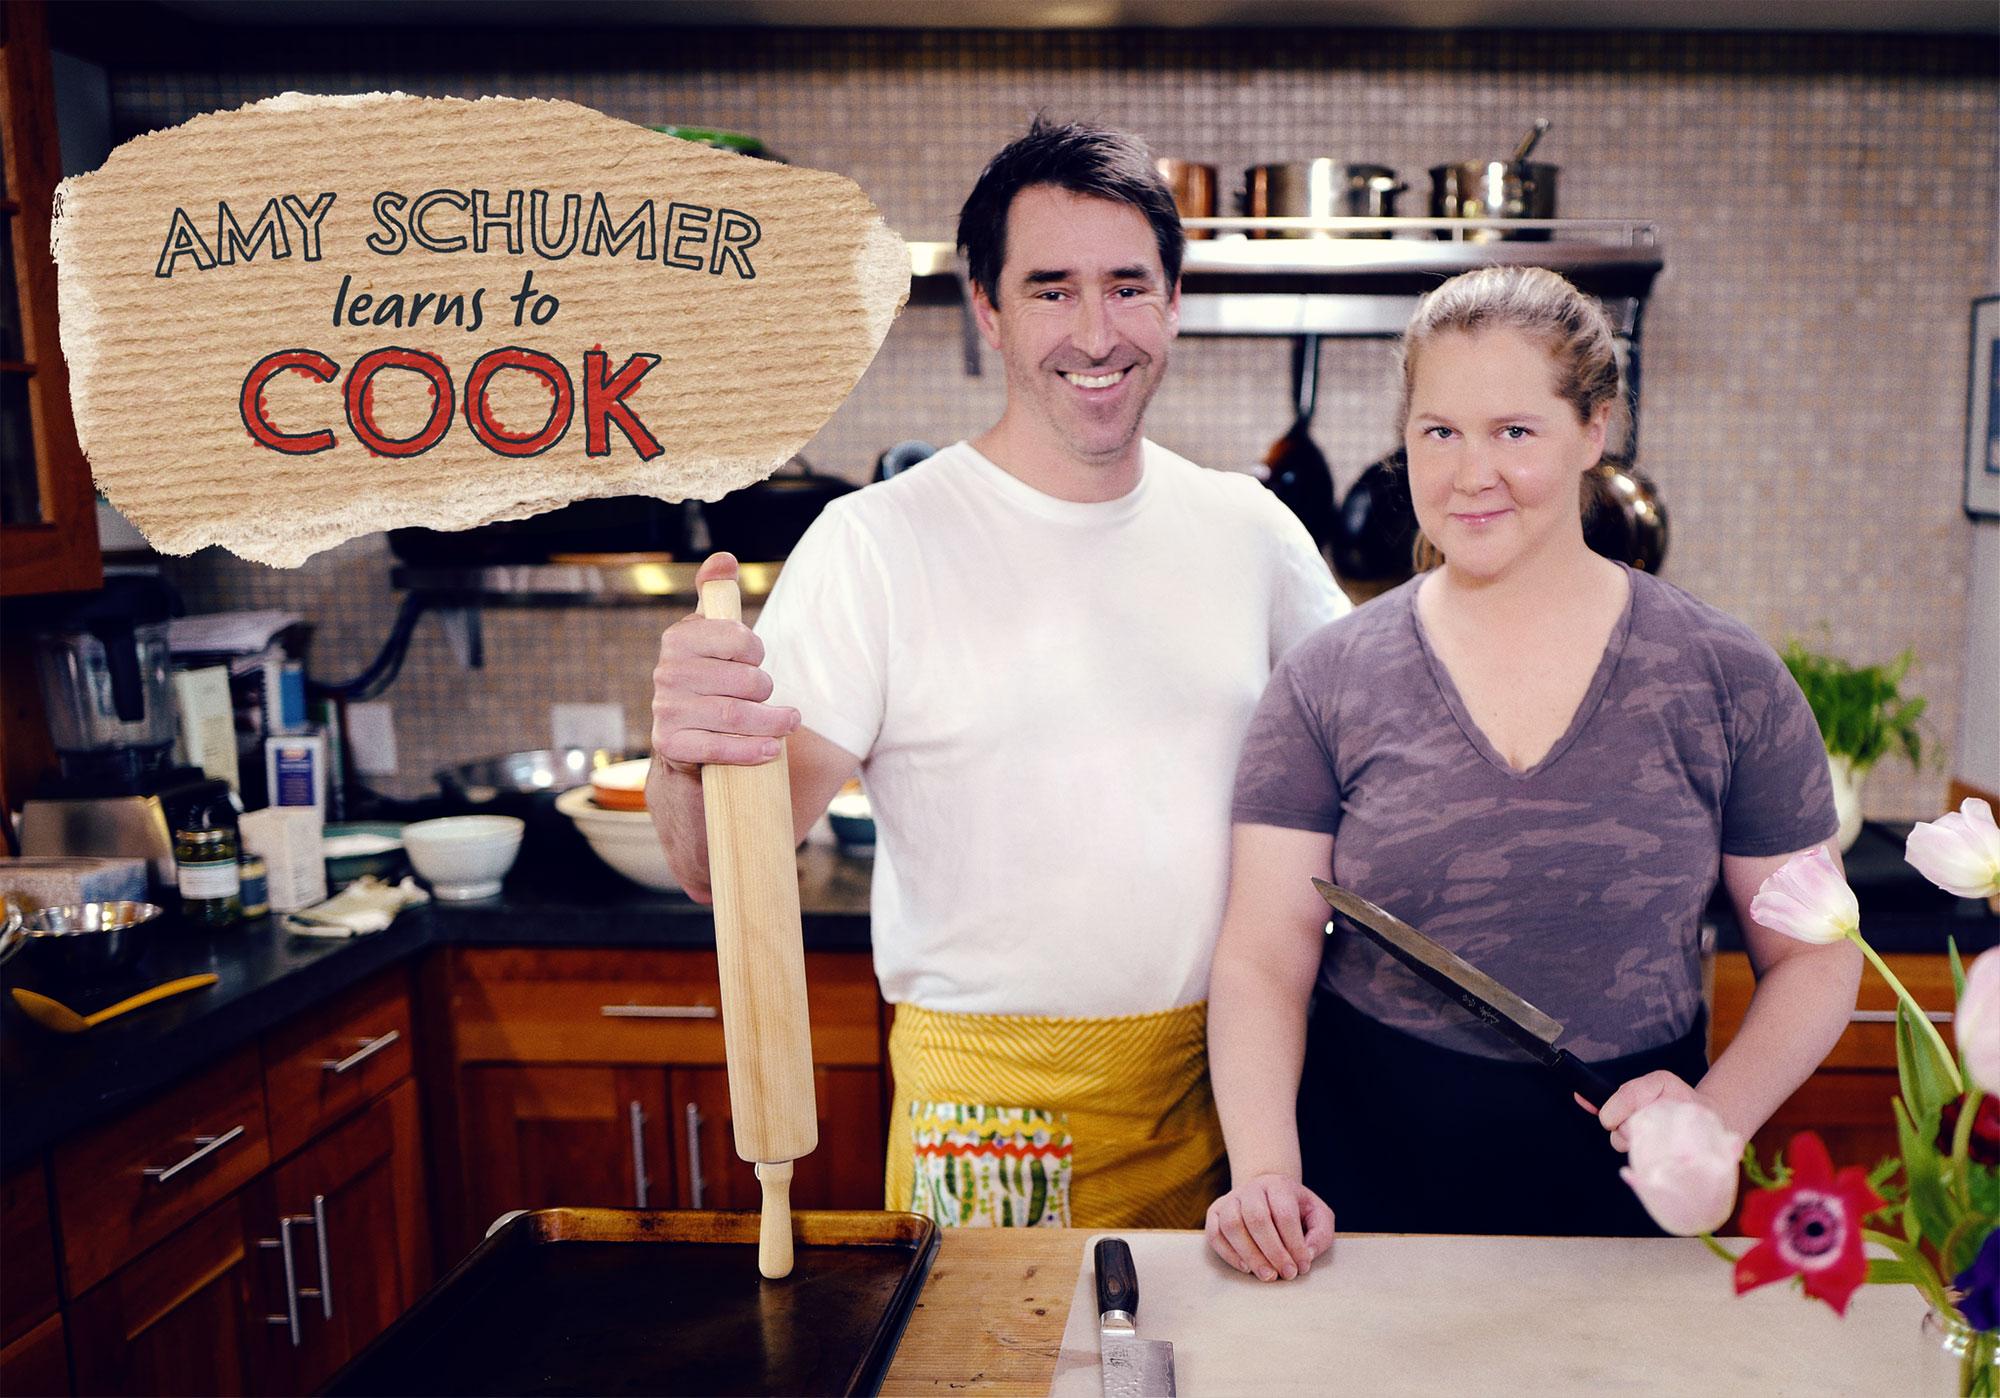 Amy Schumer Calls Cooking Show With Husband Chris Fischer Rewarding